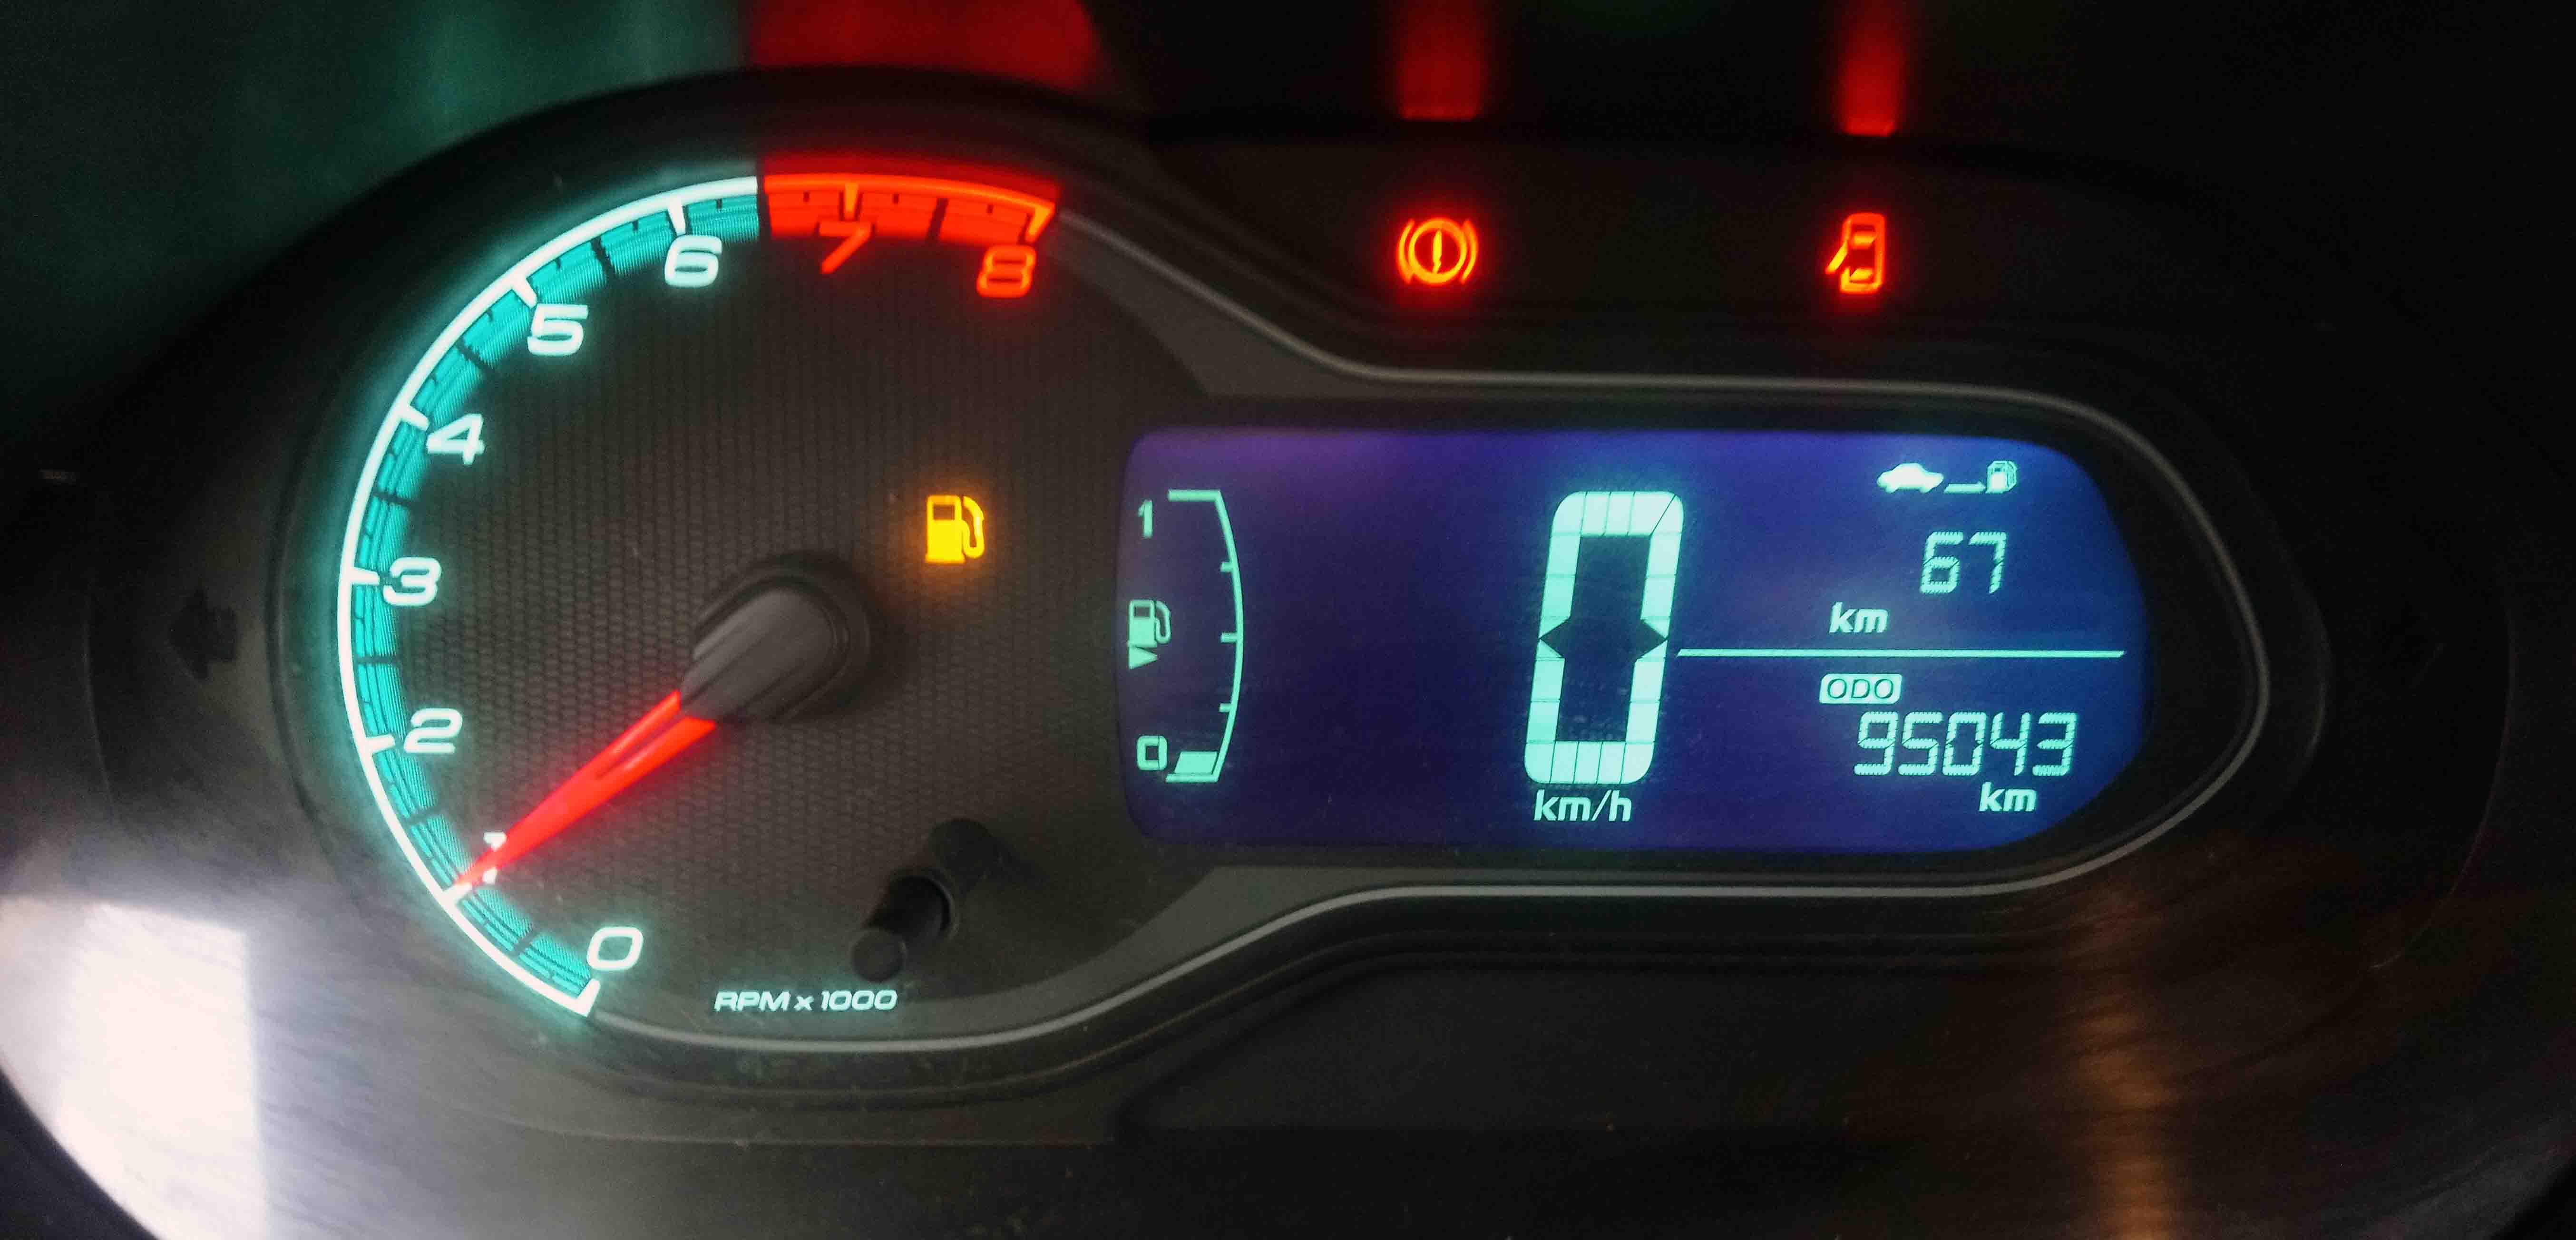 2014 Chevrolet Onix LTZ 1.4L